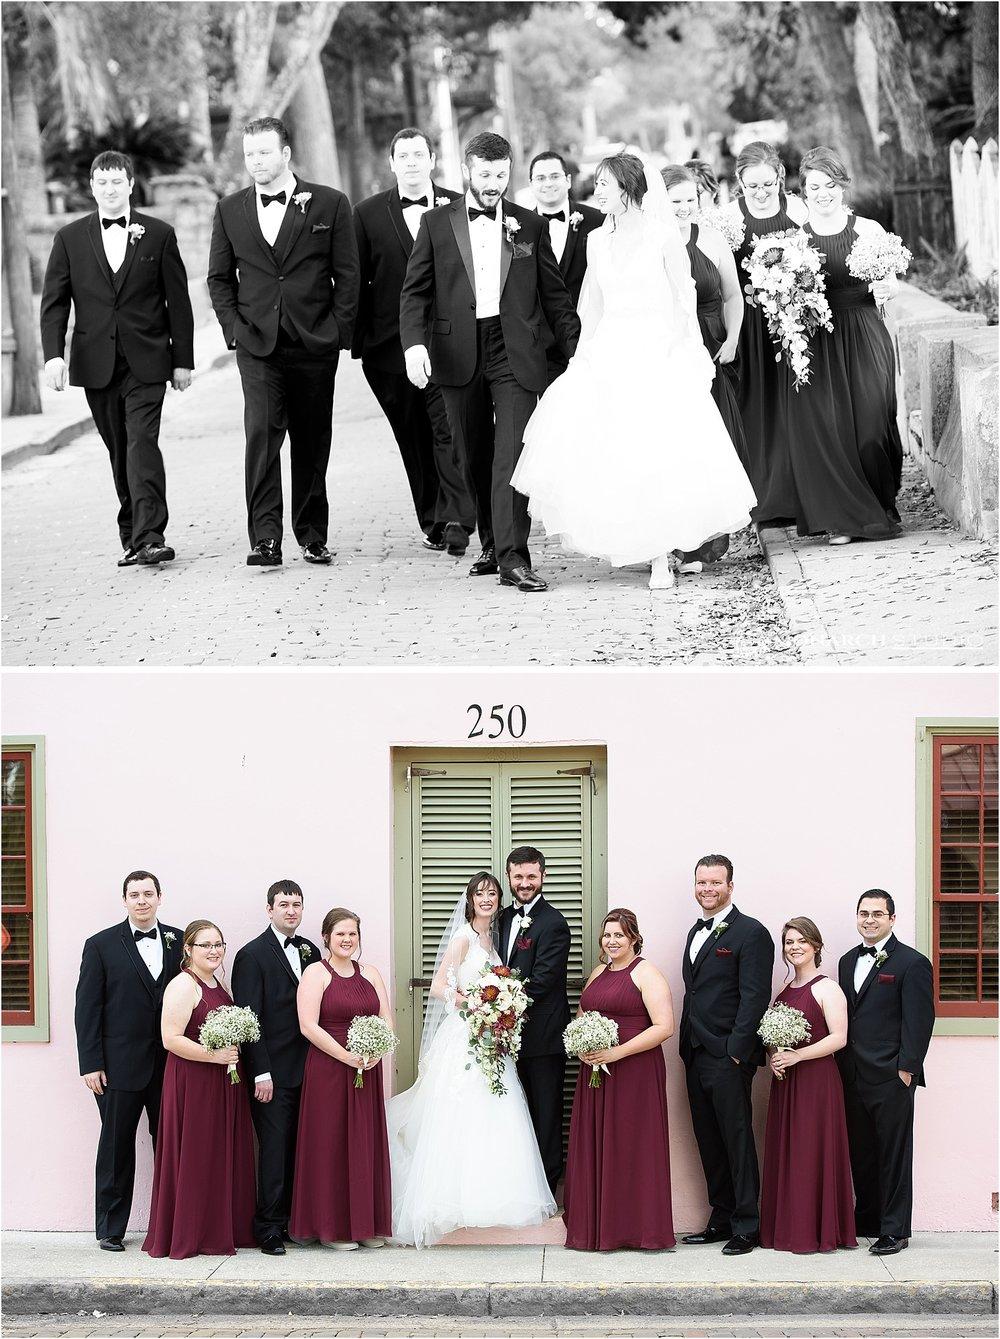 st-augustine-wedding-photographer-white-room-037.jpg